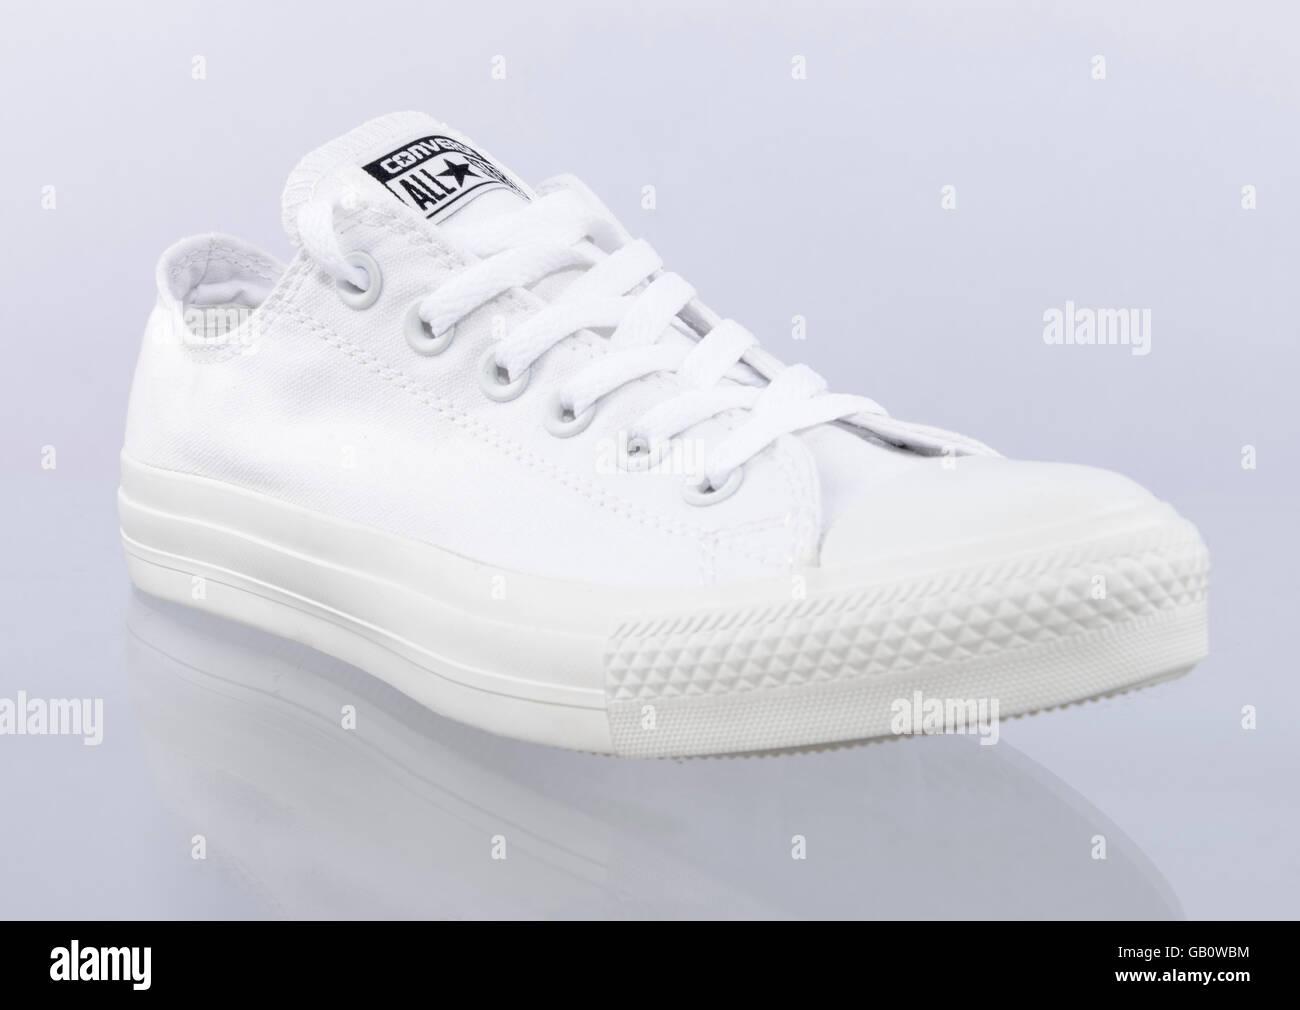 6f30cb494e0e White Converse Stock Photos   White Converse Stock Images - Alamy